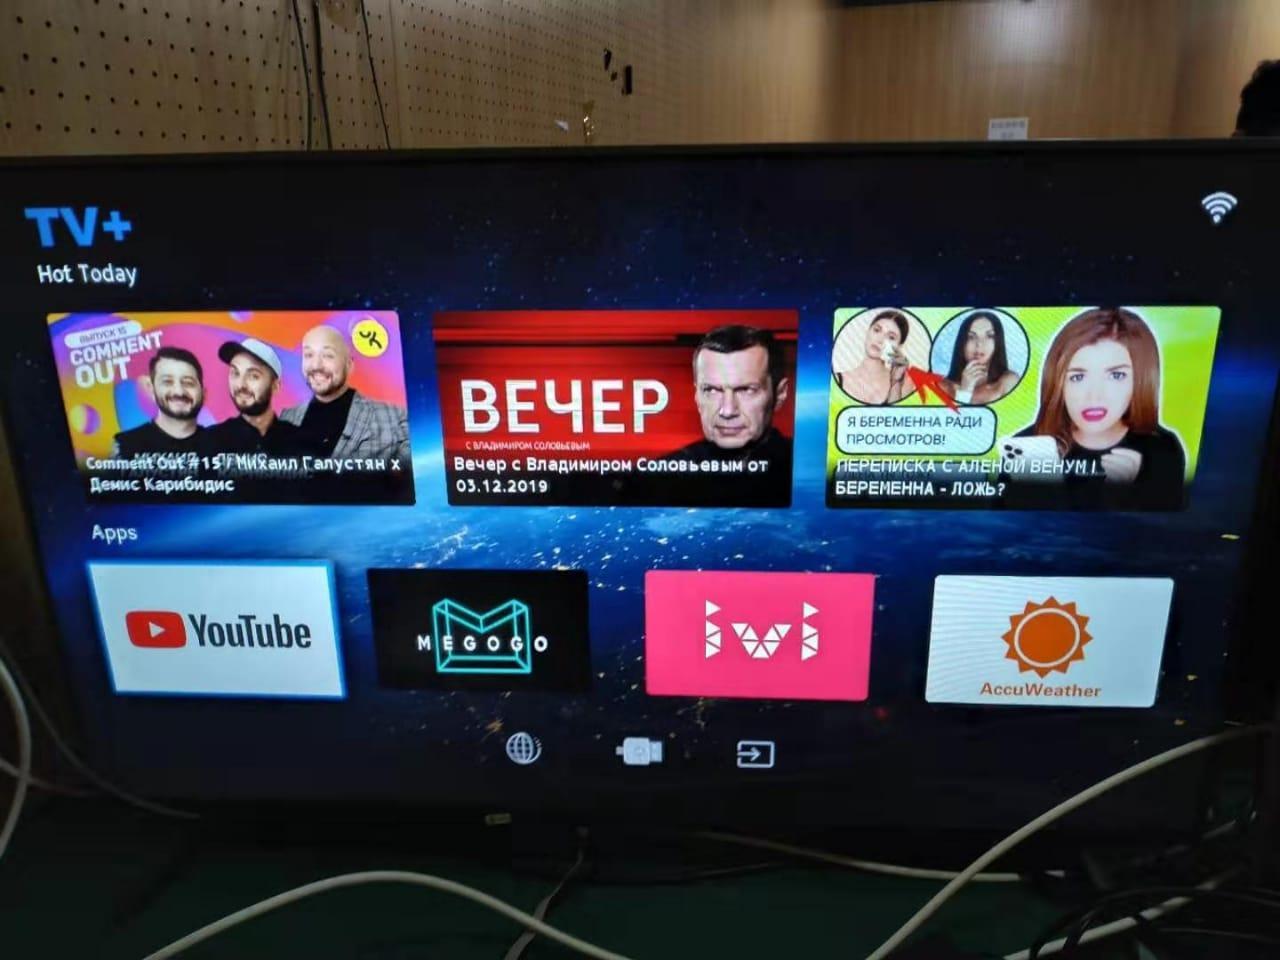 Телевизор YASIN LED-32E8000 WI-FI,YOUTUBE - фото 2